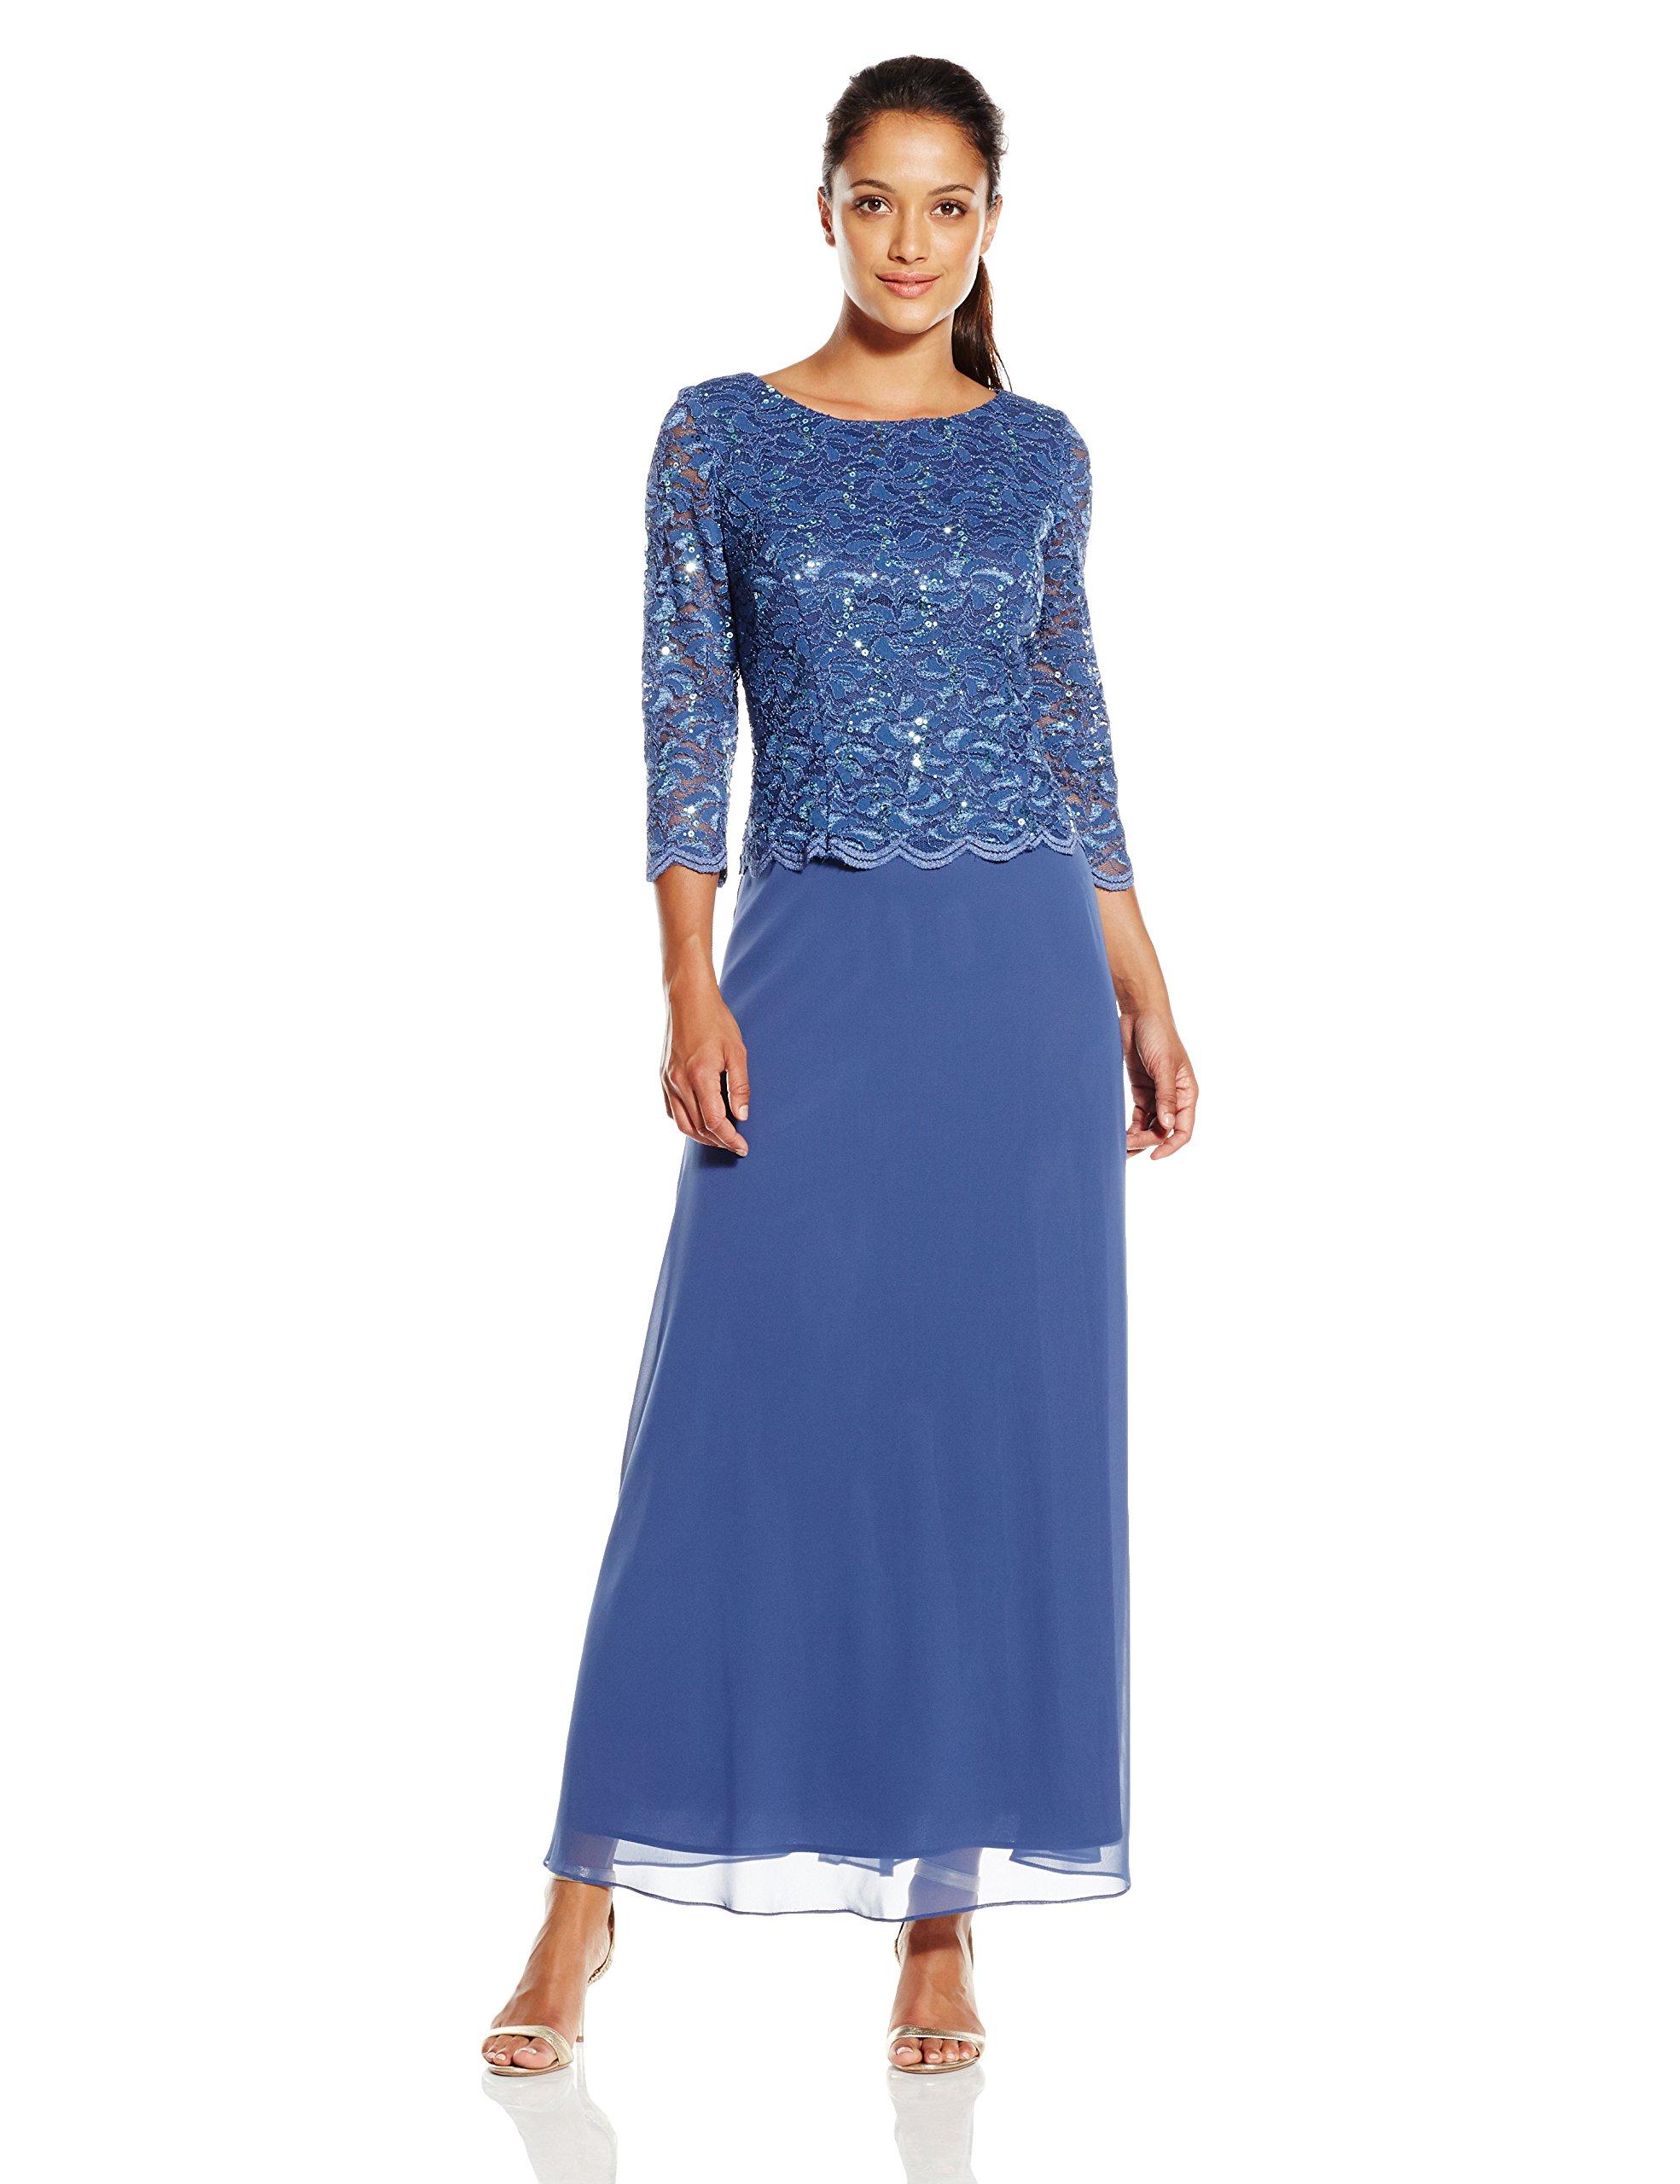 Alex Evenings Women's Petite Long Lace and Chiffon Dress, Wedgewood, 14/Petite